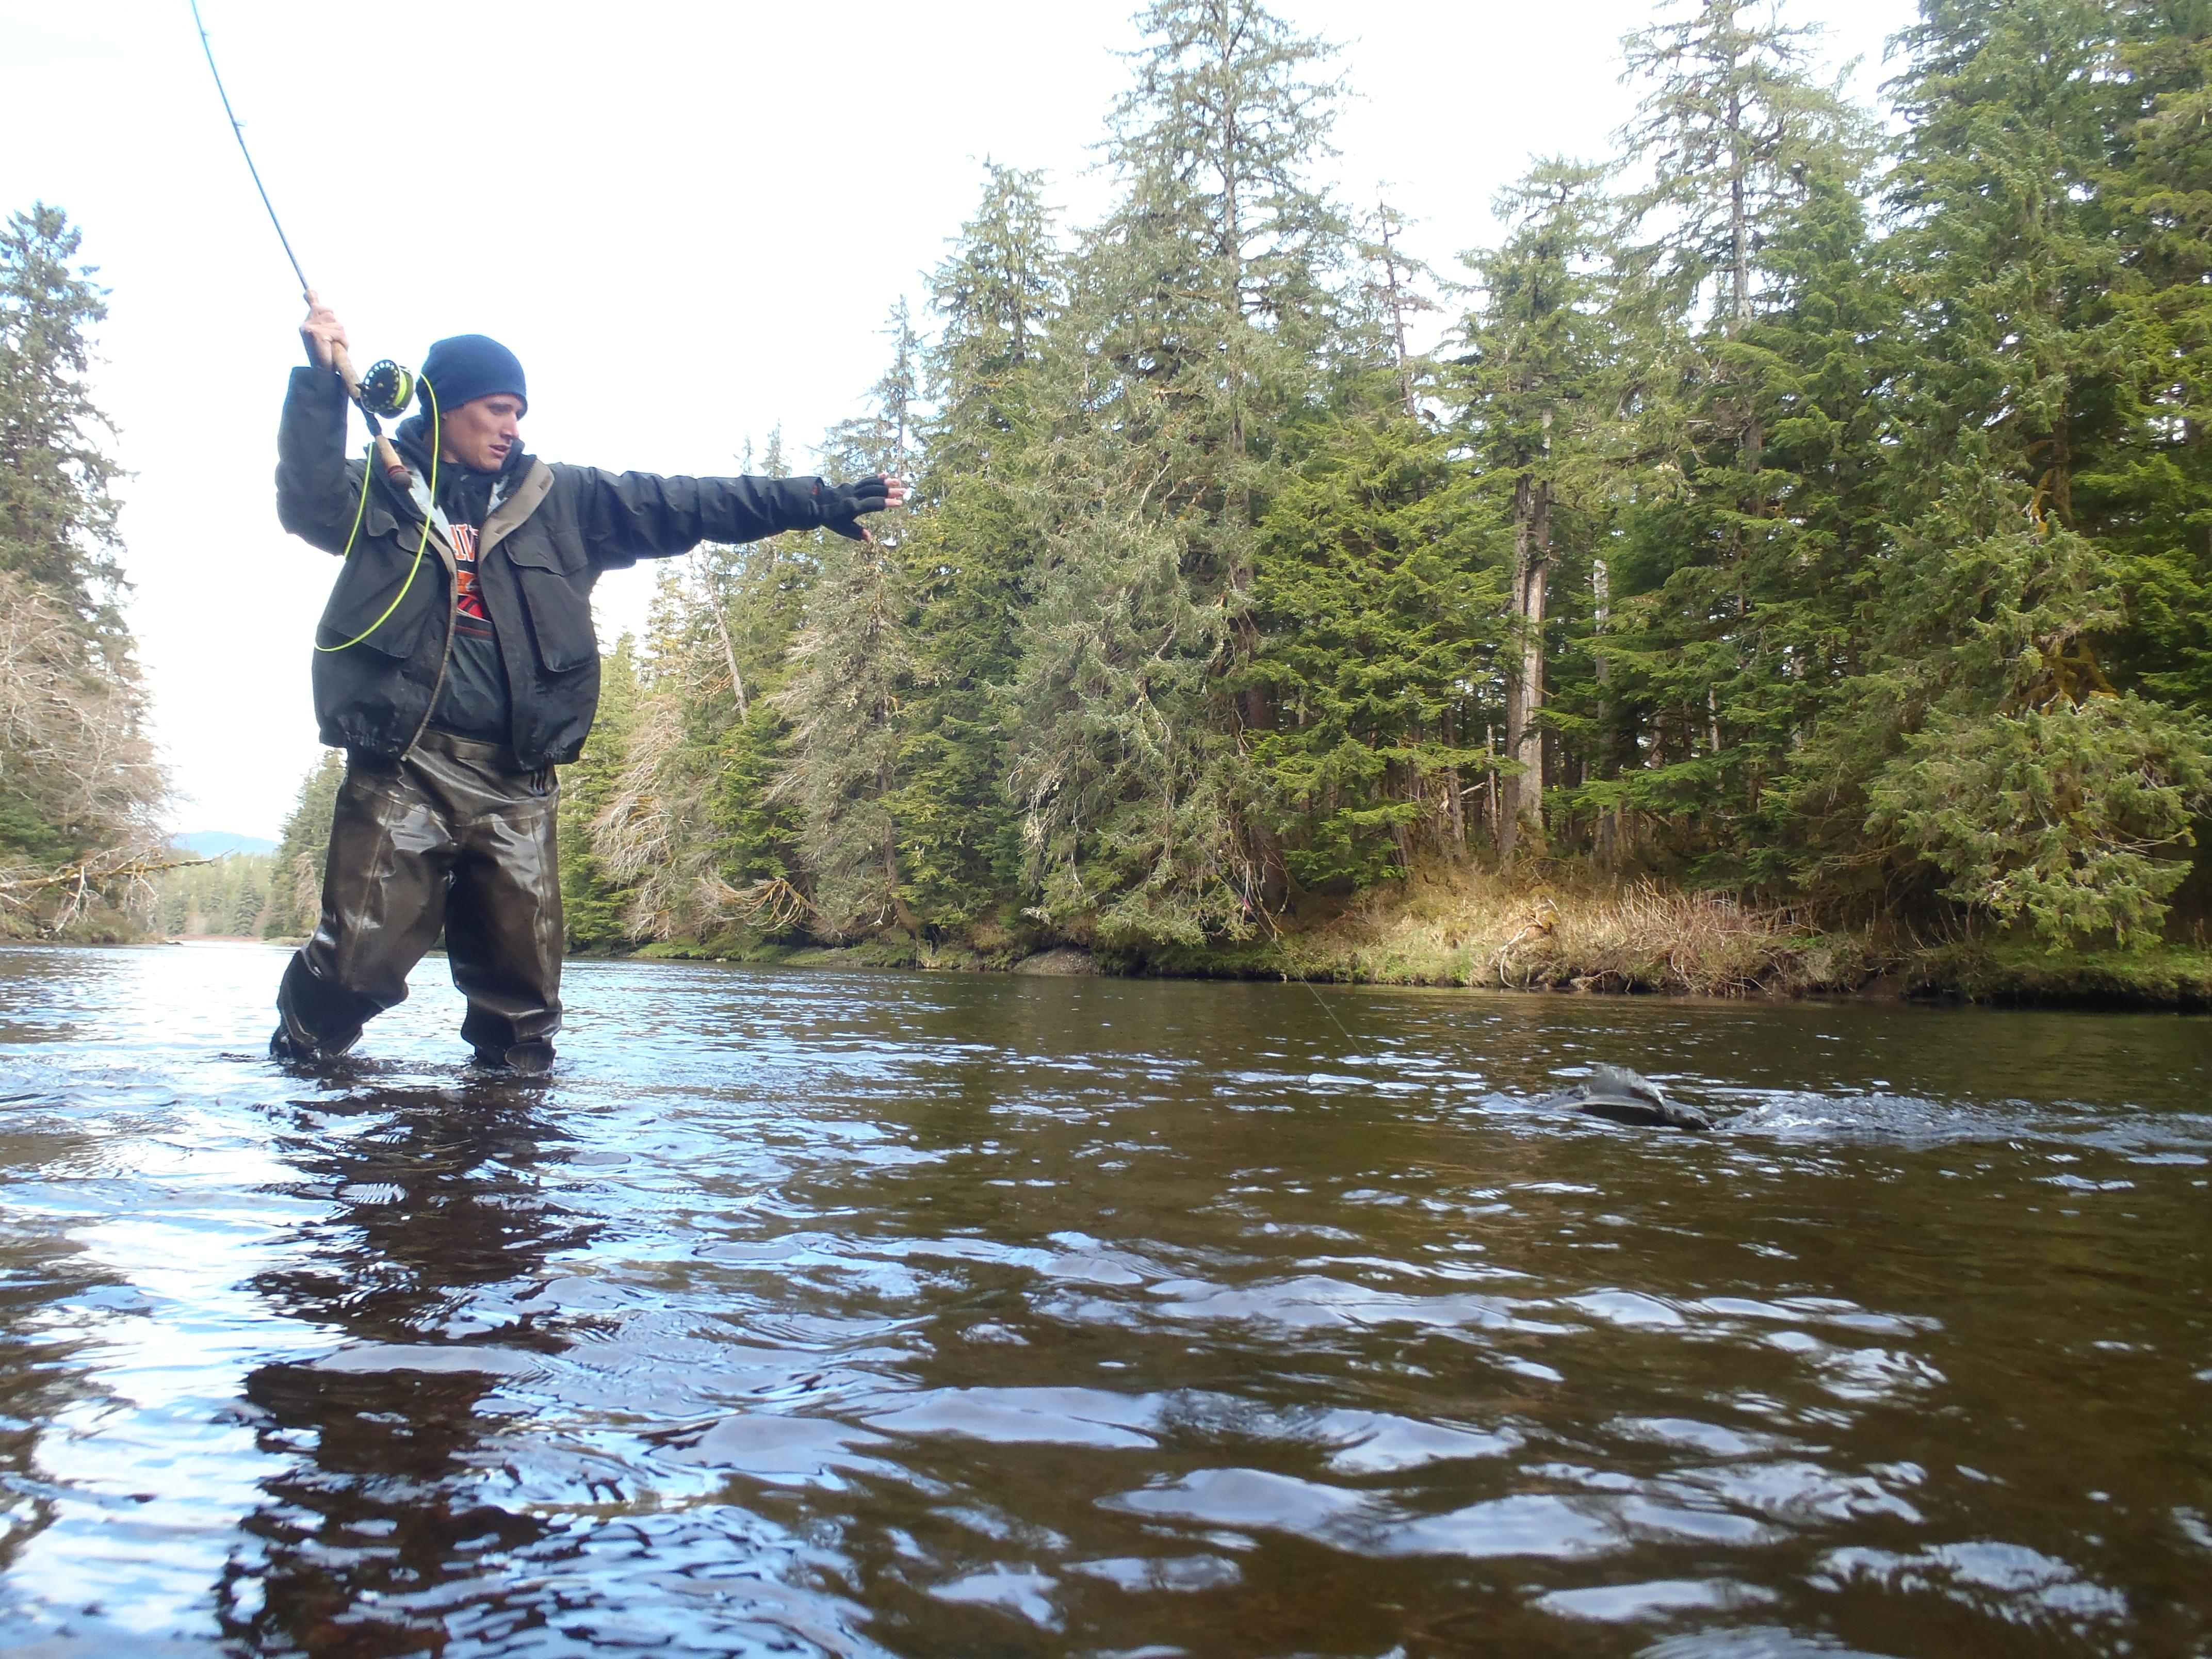 Prince of wales fly fishing southeast alaska steelhead for Prince of wales island fishing